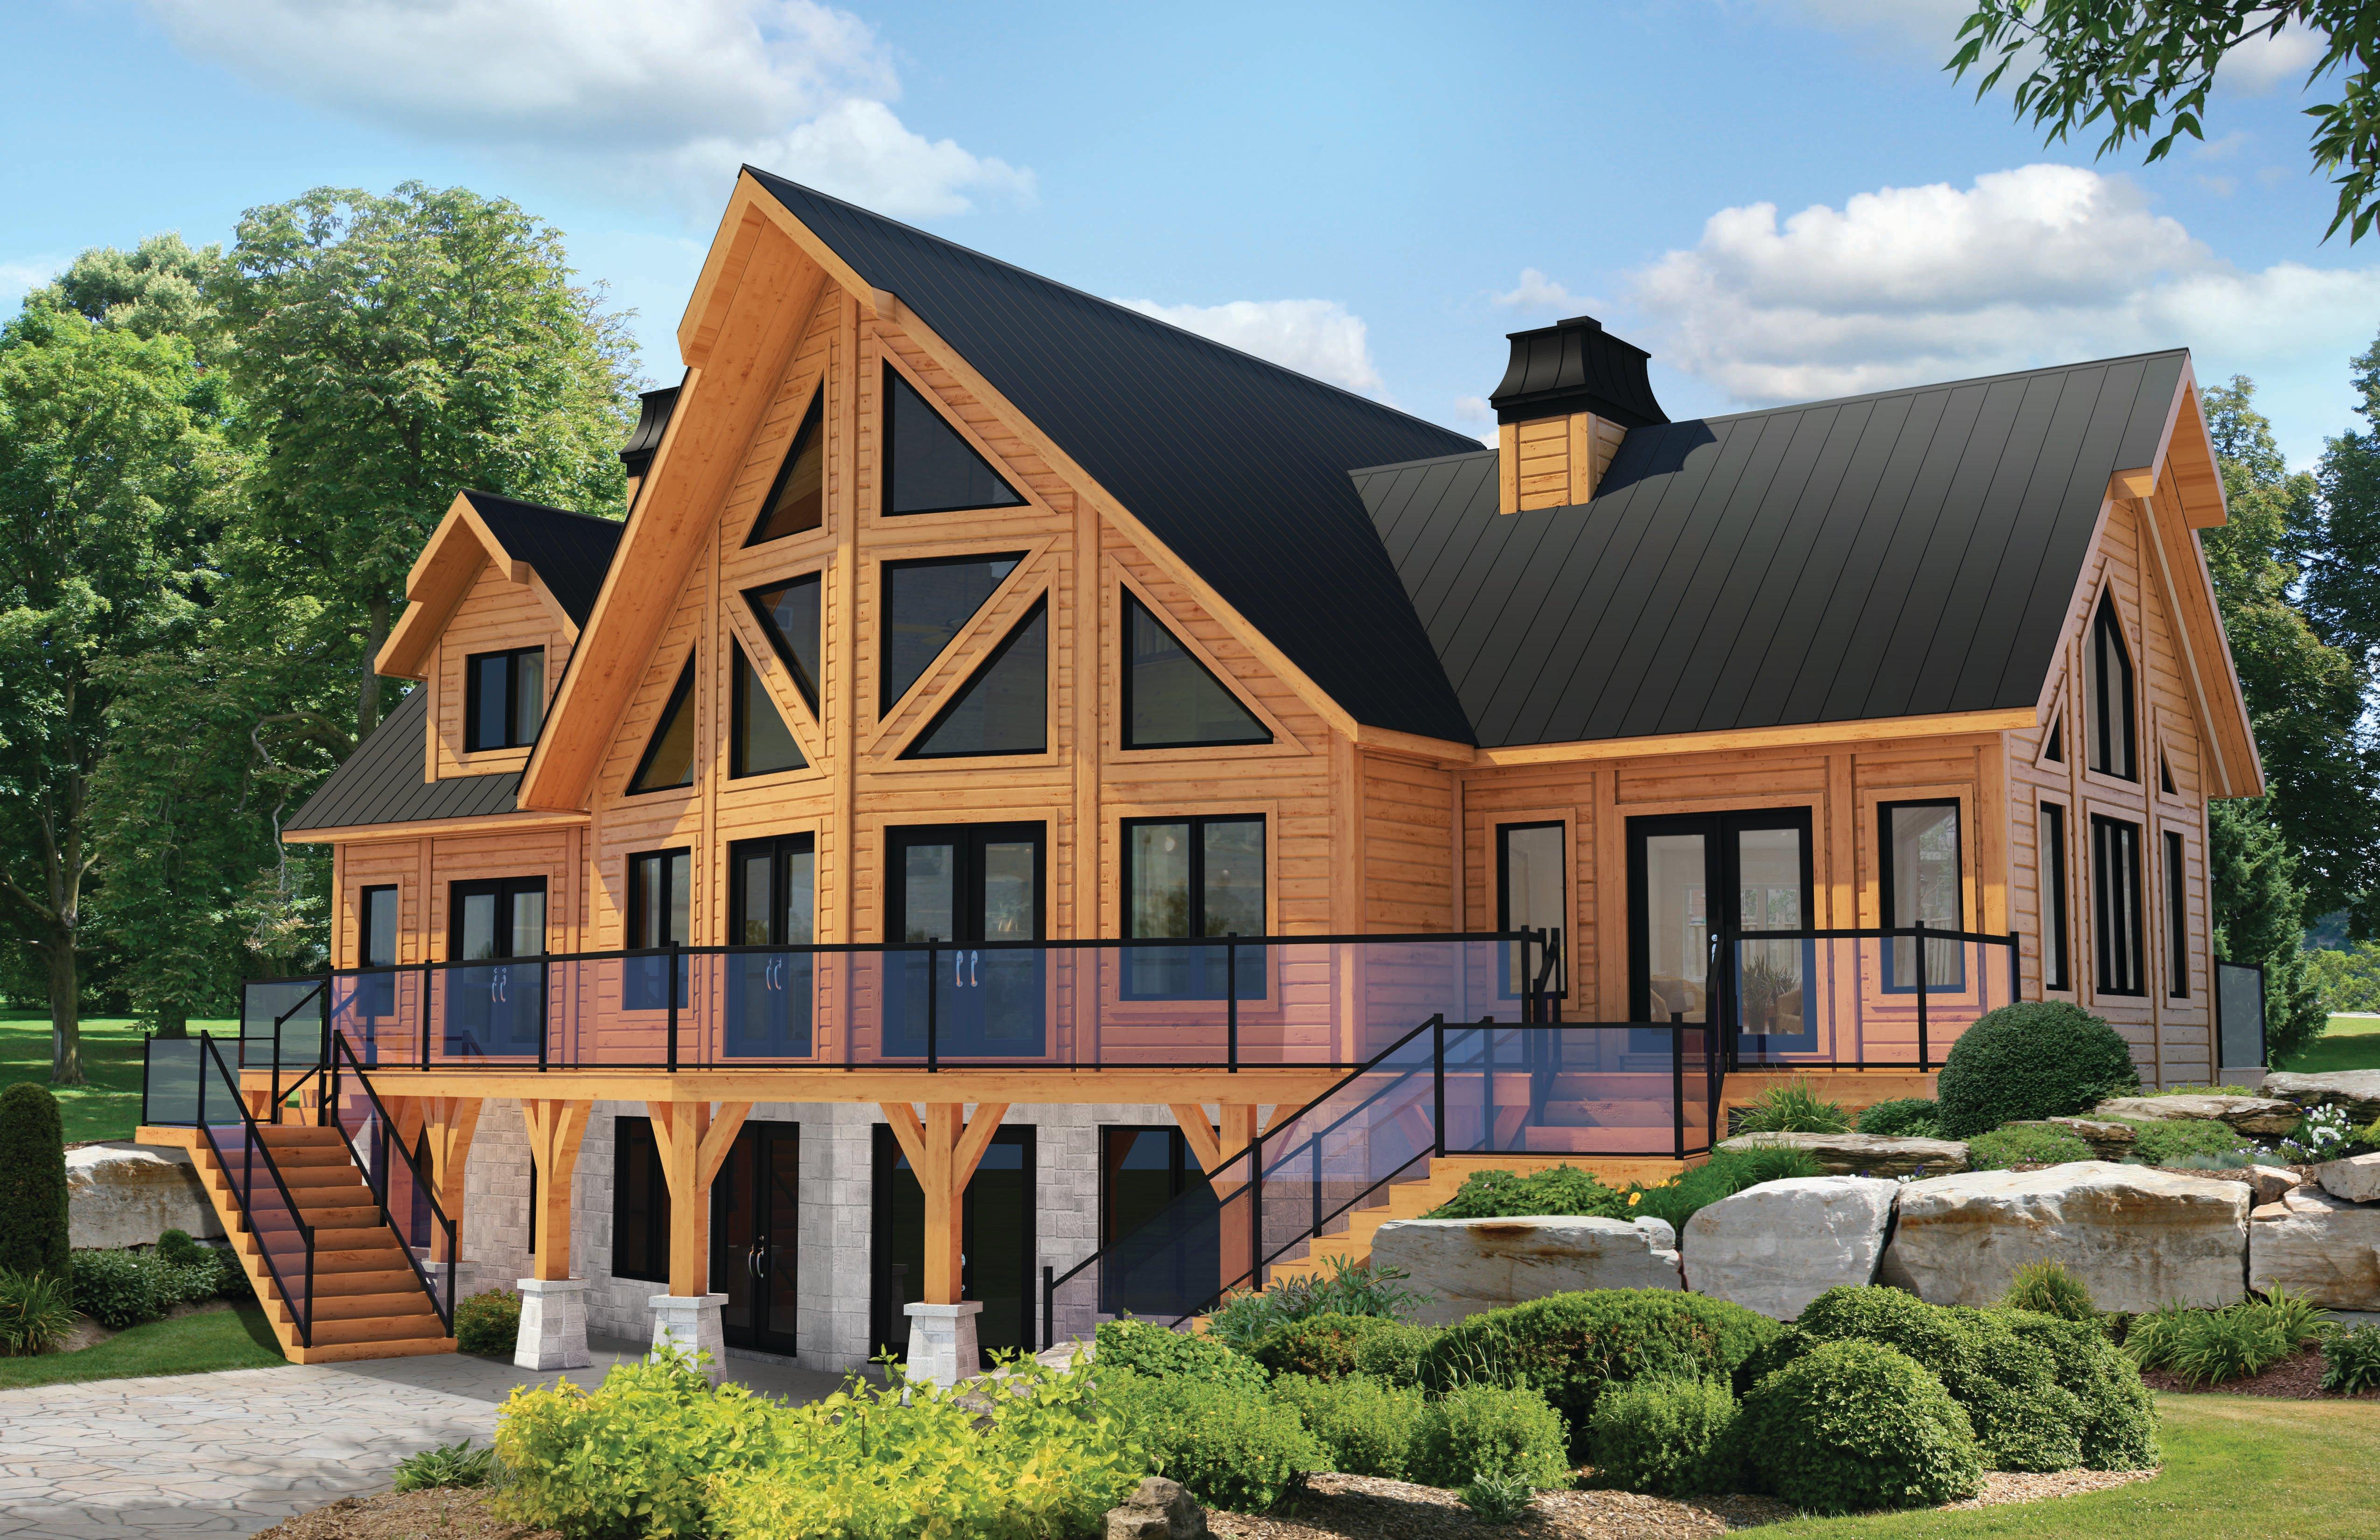 Timber Block Denver Model